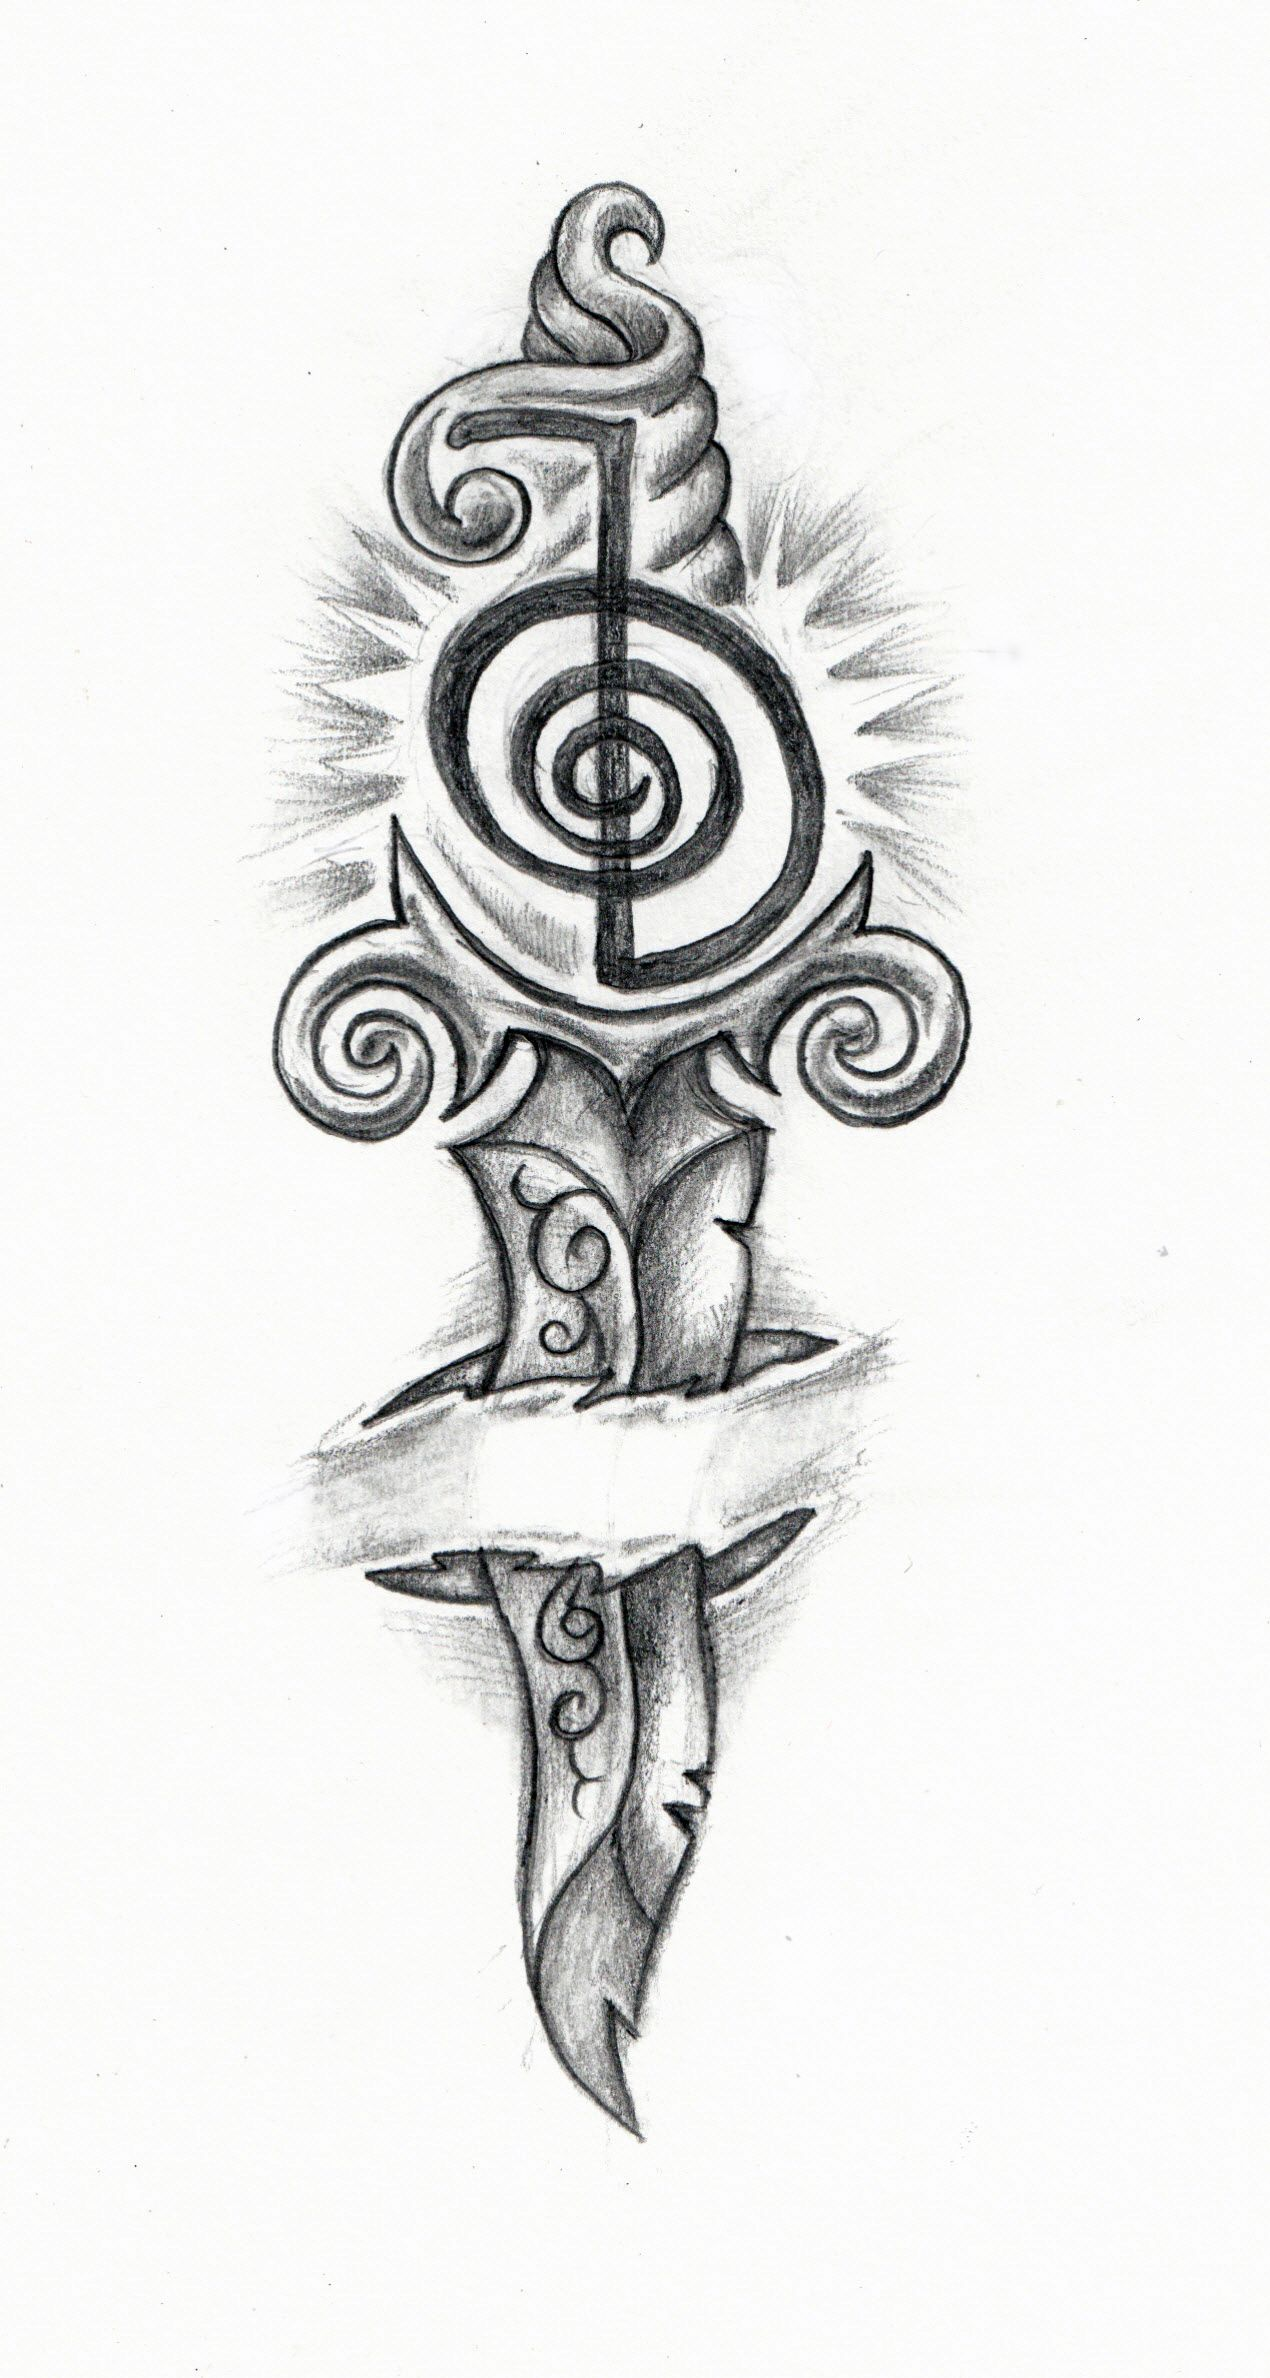 Dagger tattoo meanings itattoodesigns - My New Tattoo Design Reiki Strength Knife